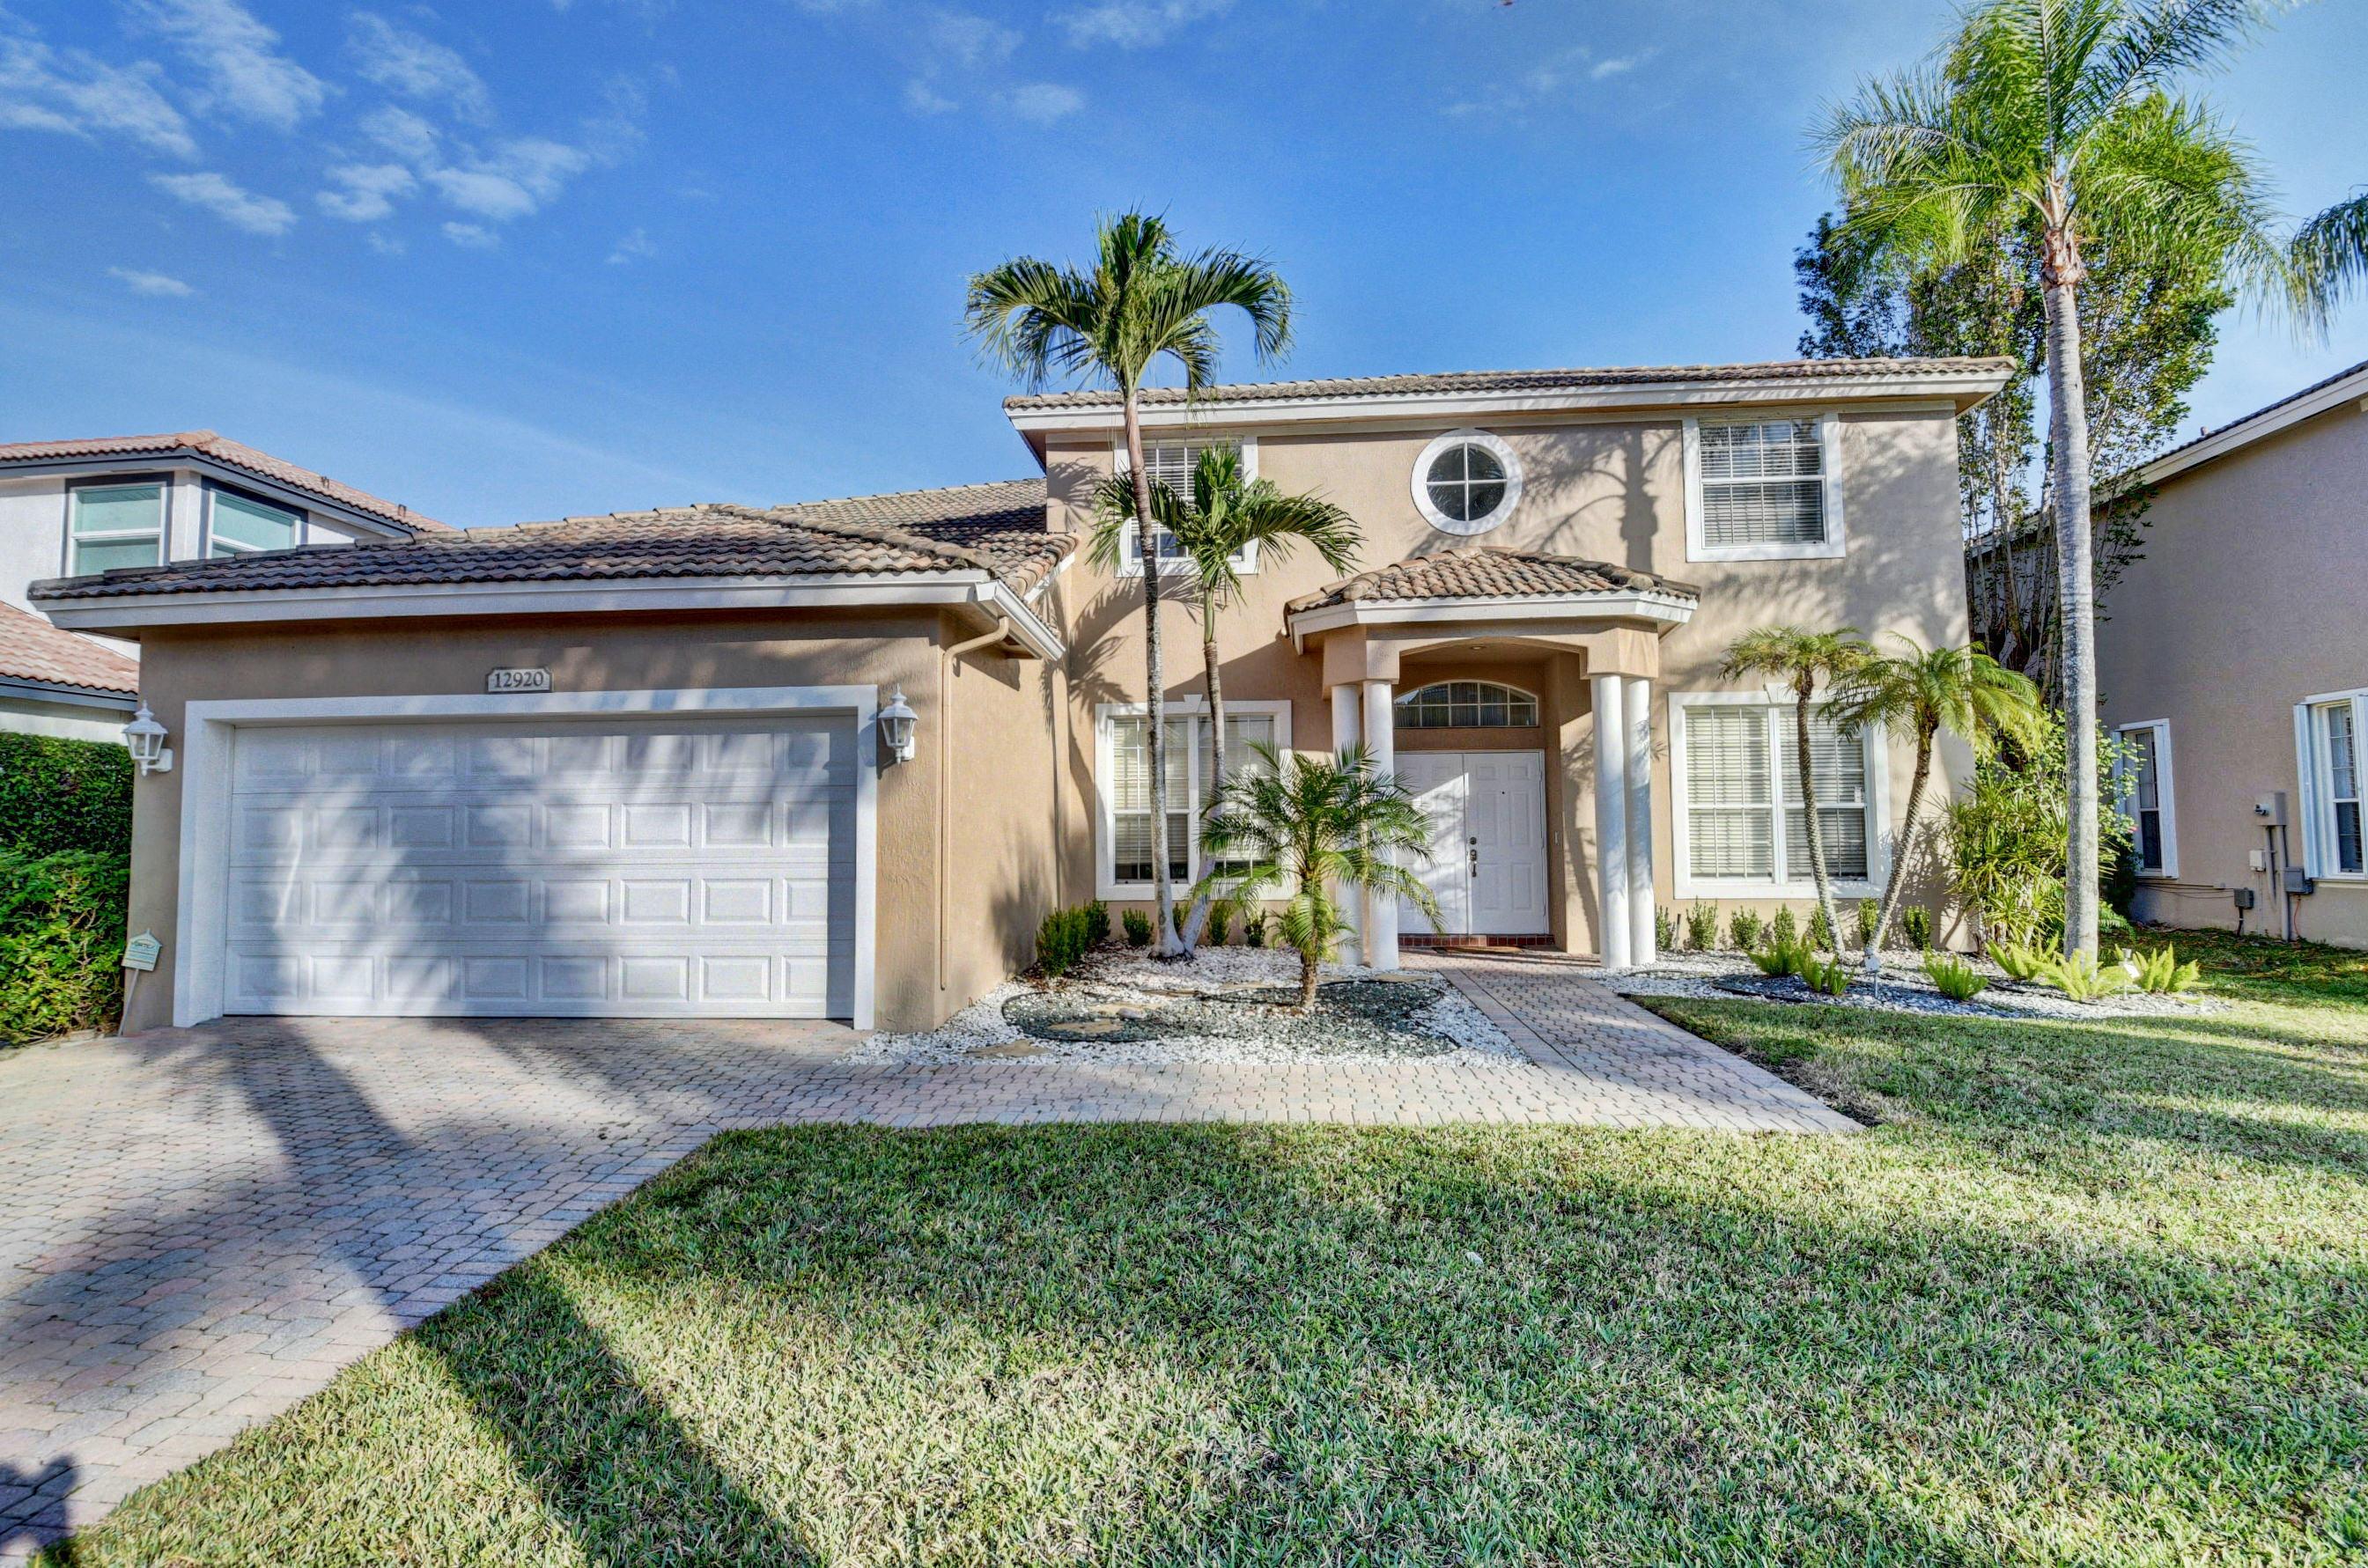 12920 Hyland Circle Boca Raton, FL 33428